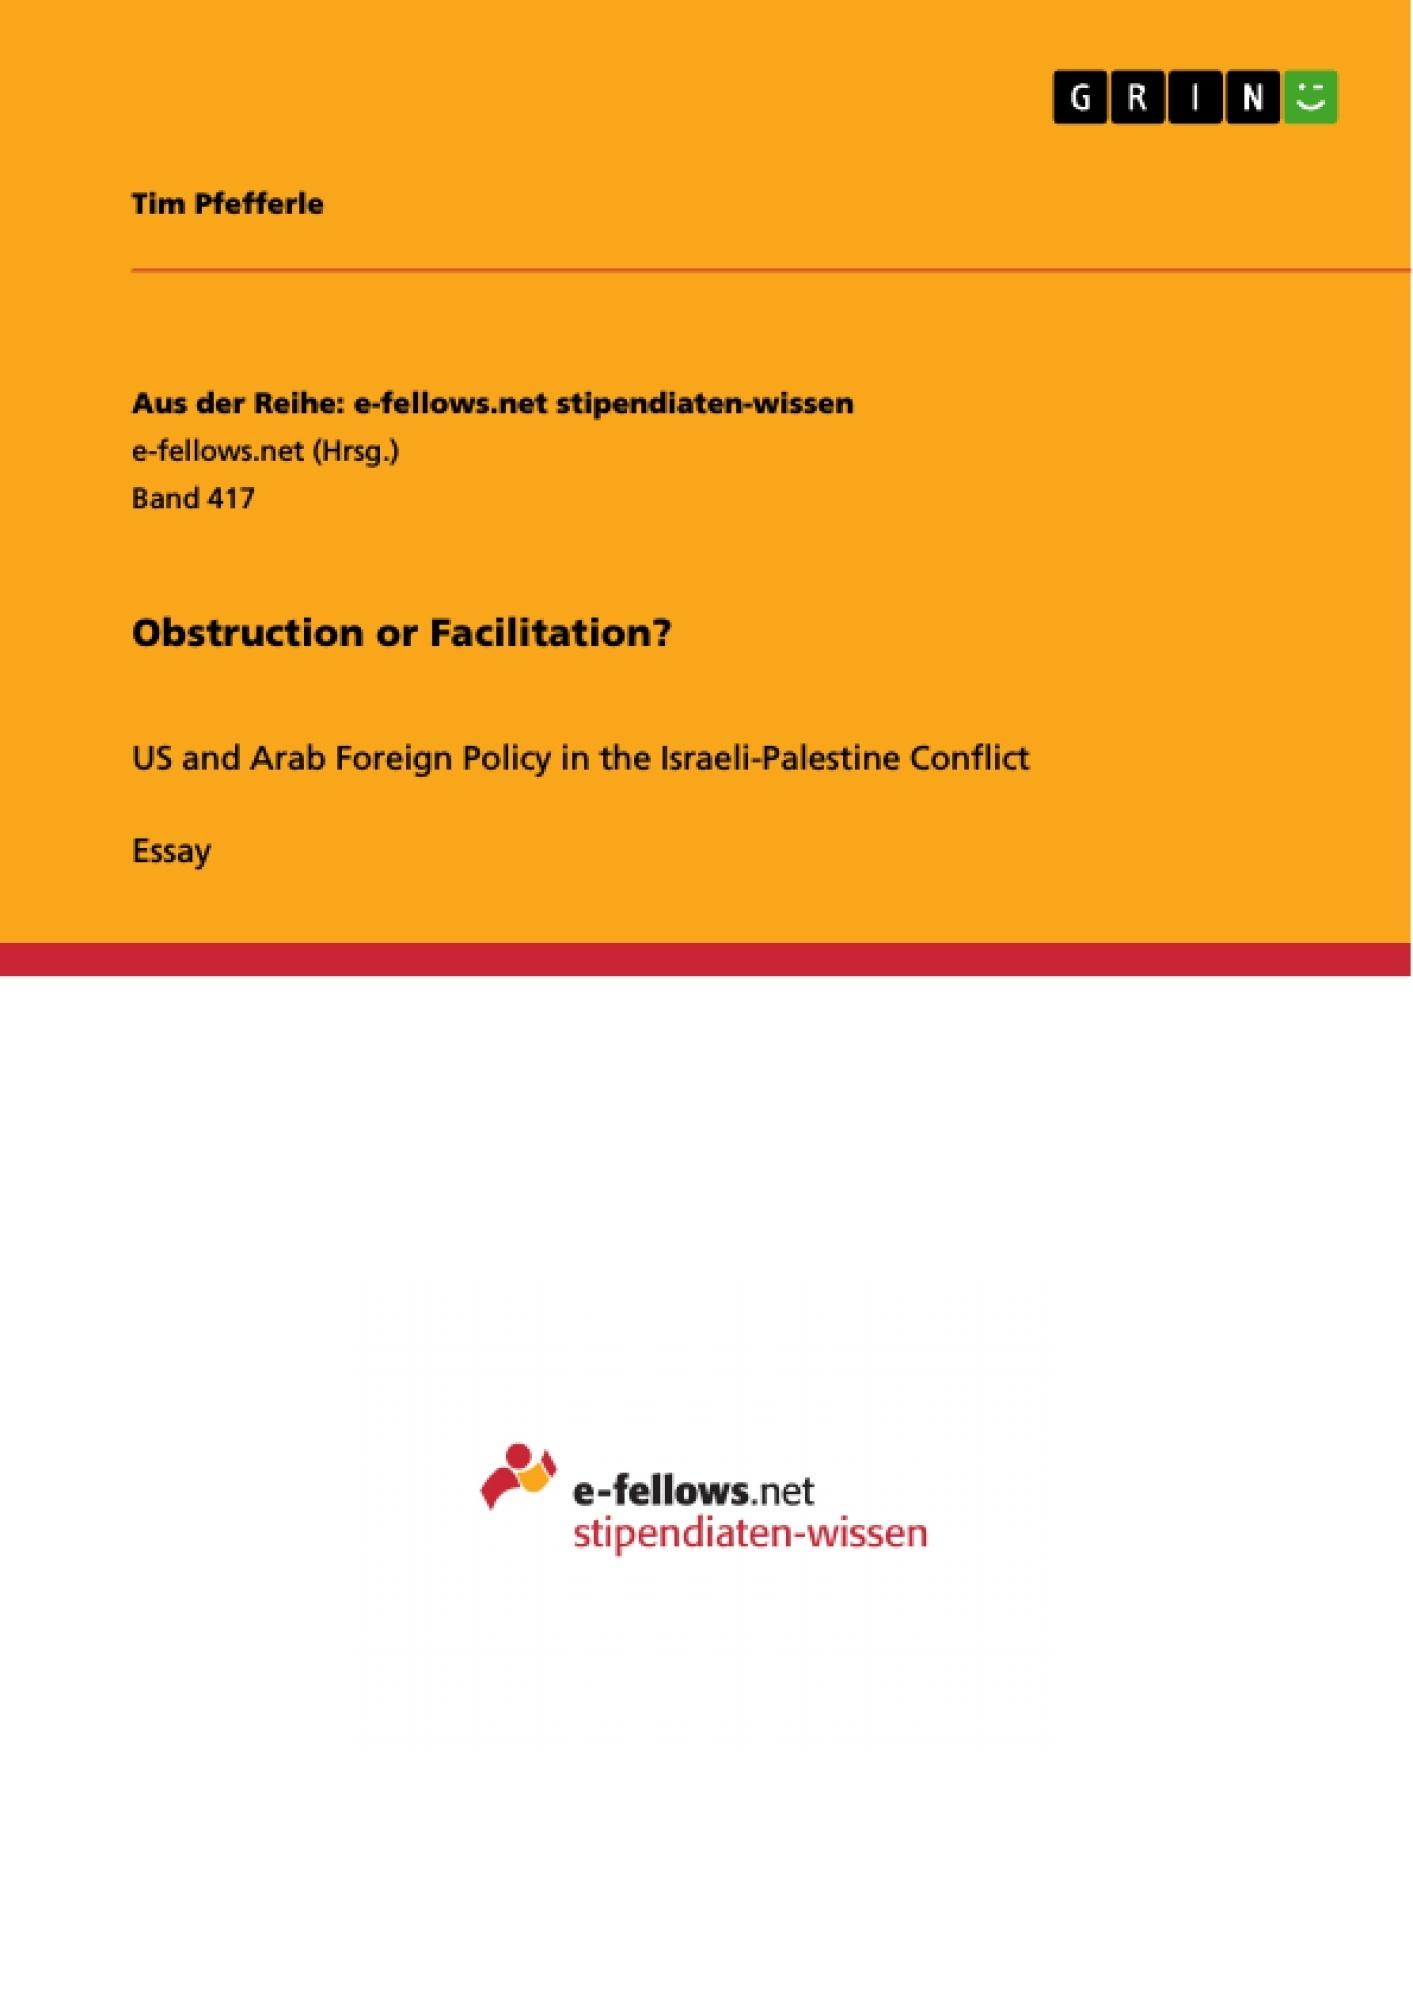 Title: Obstruction or Facilitation?